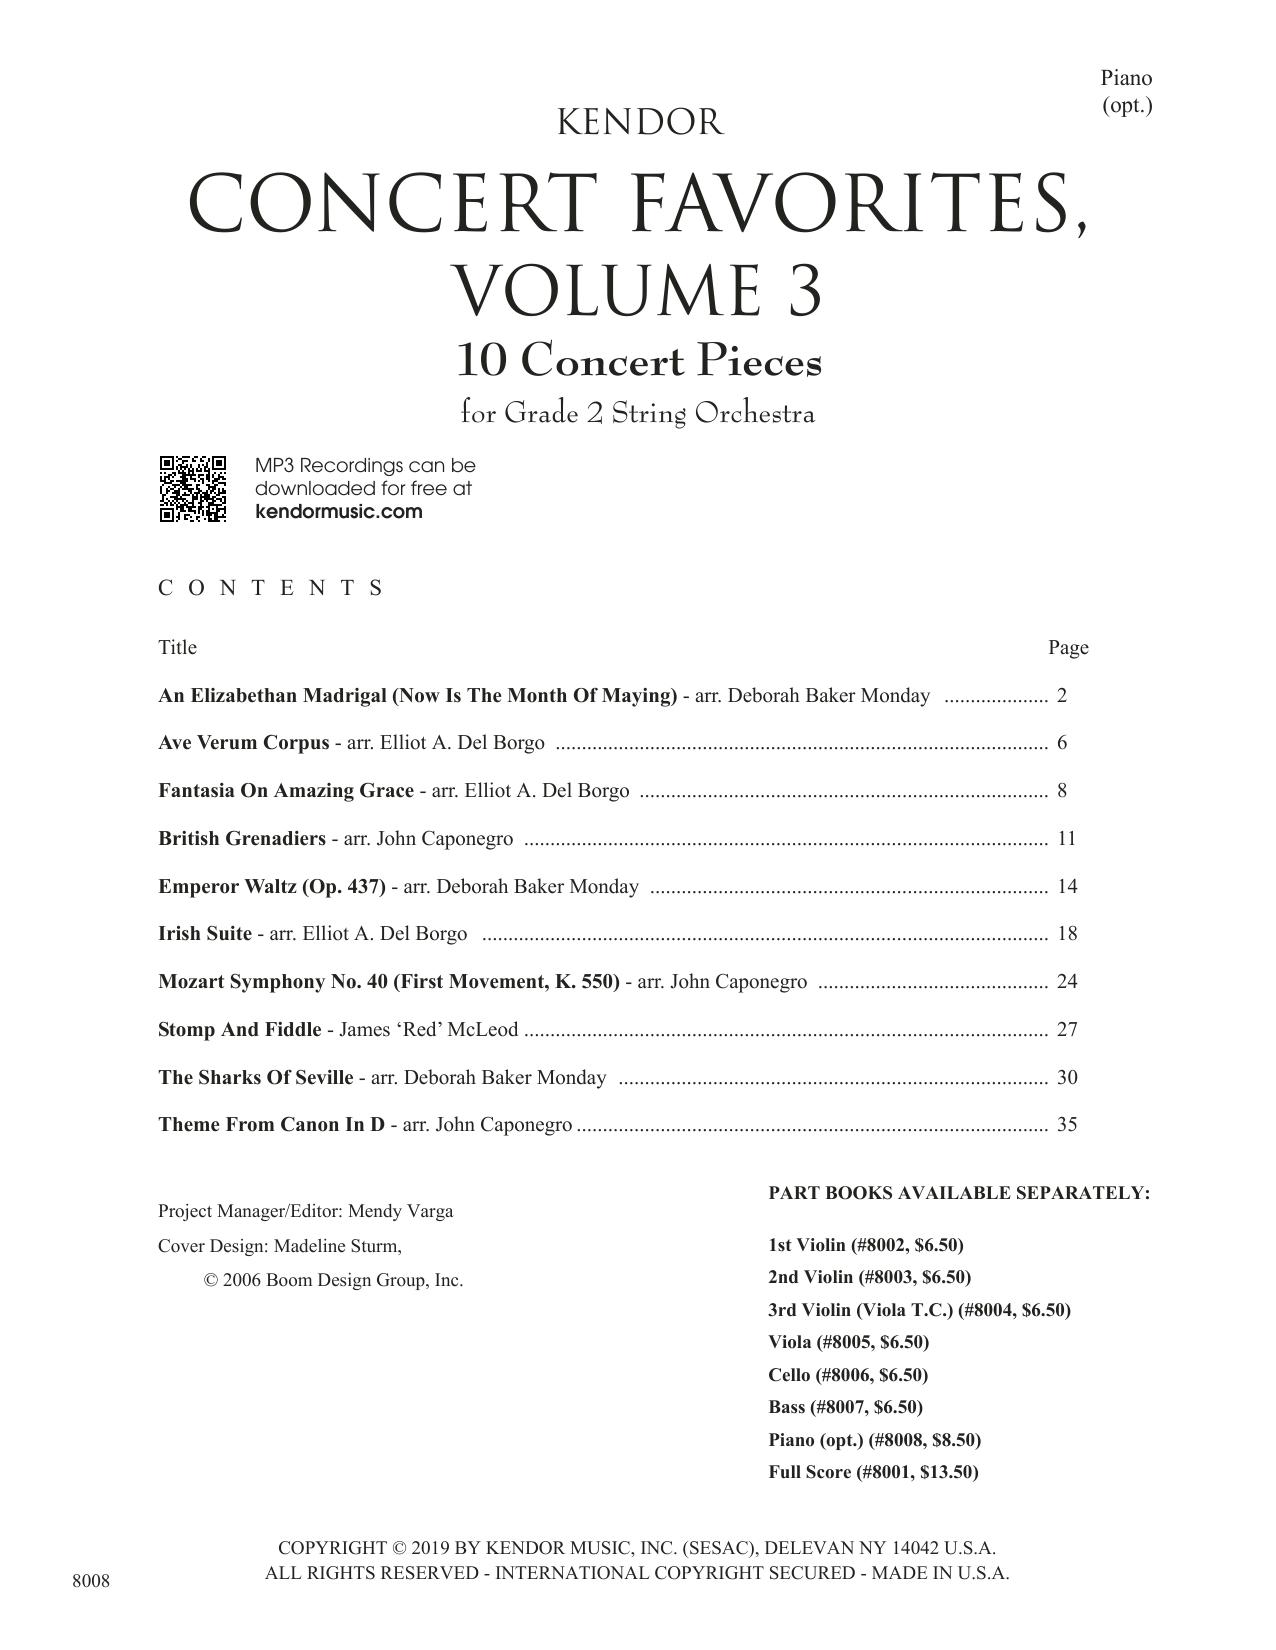 Kendor Concert Favorites, Volume 3 - Piano (opt.) Sheet Music